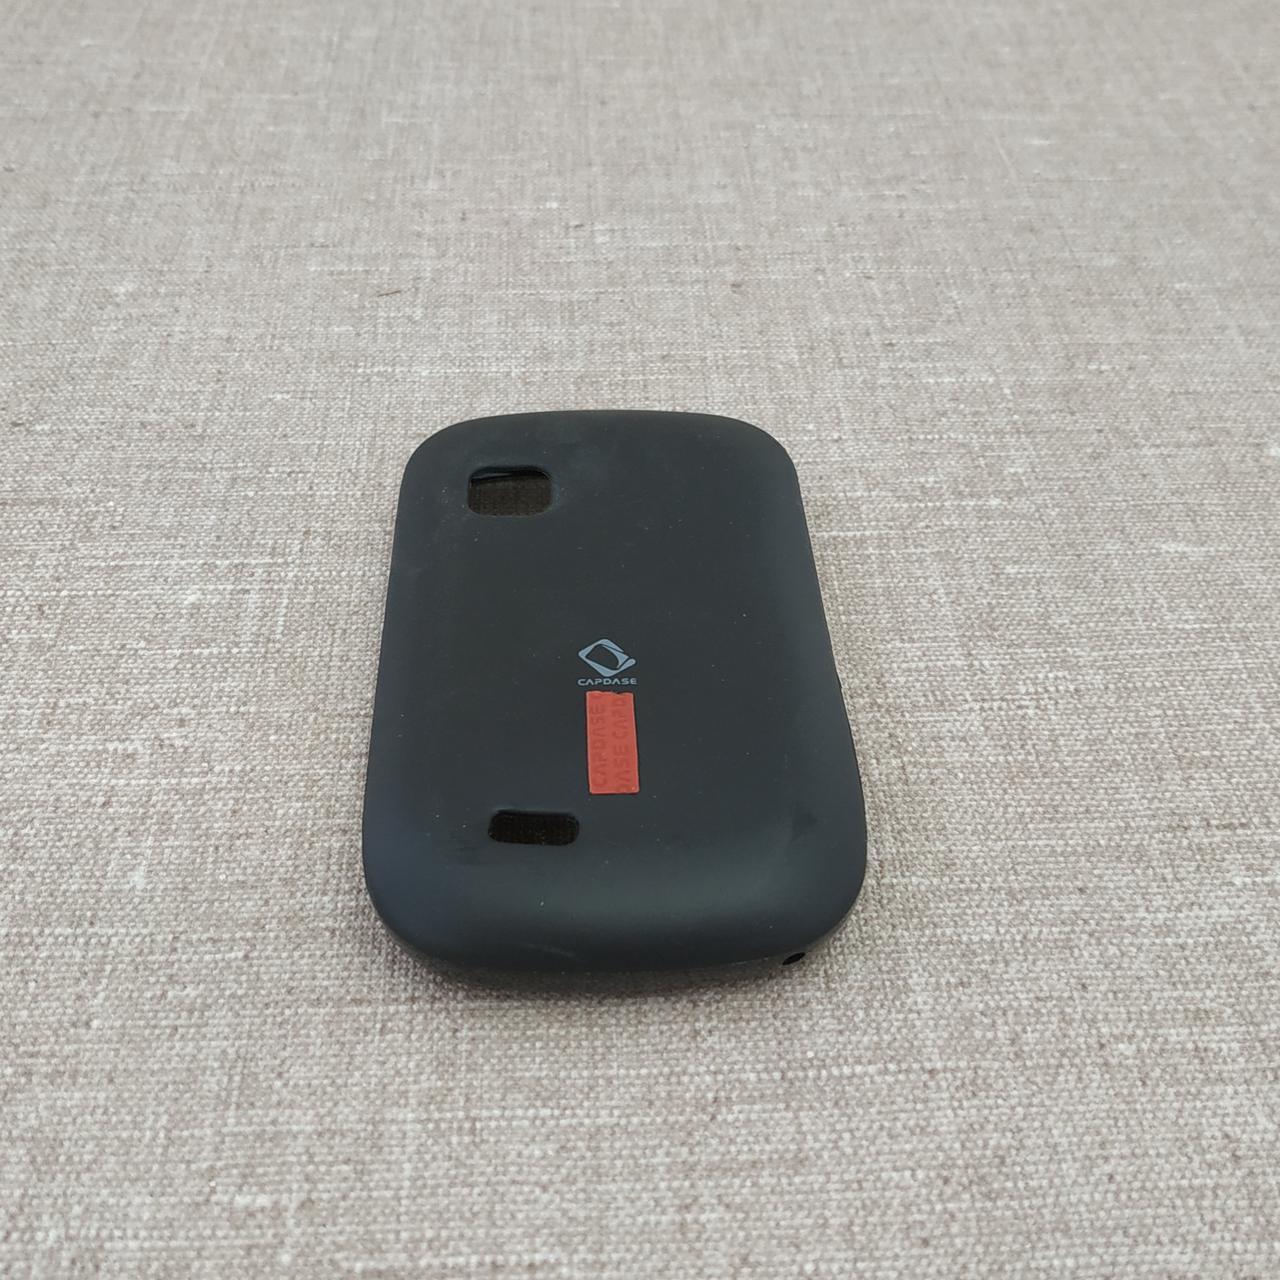 Чехлы для Galaxy других серий Capdase Samsung Fit S5670 black (S5670)